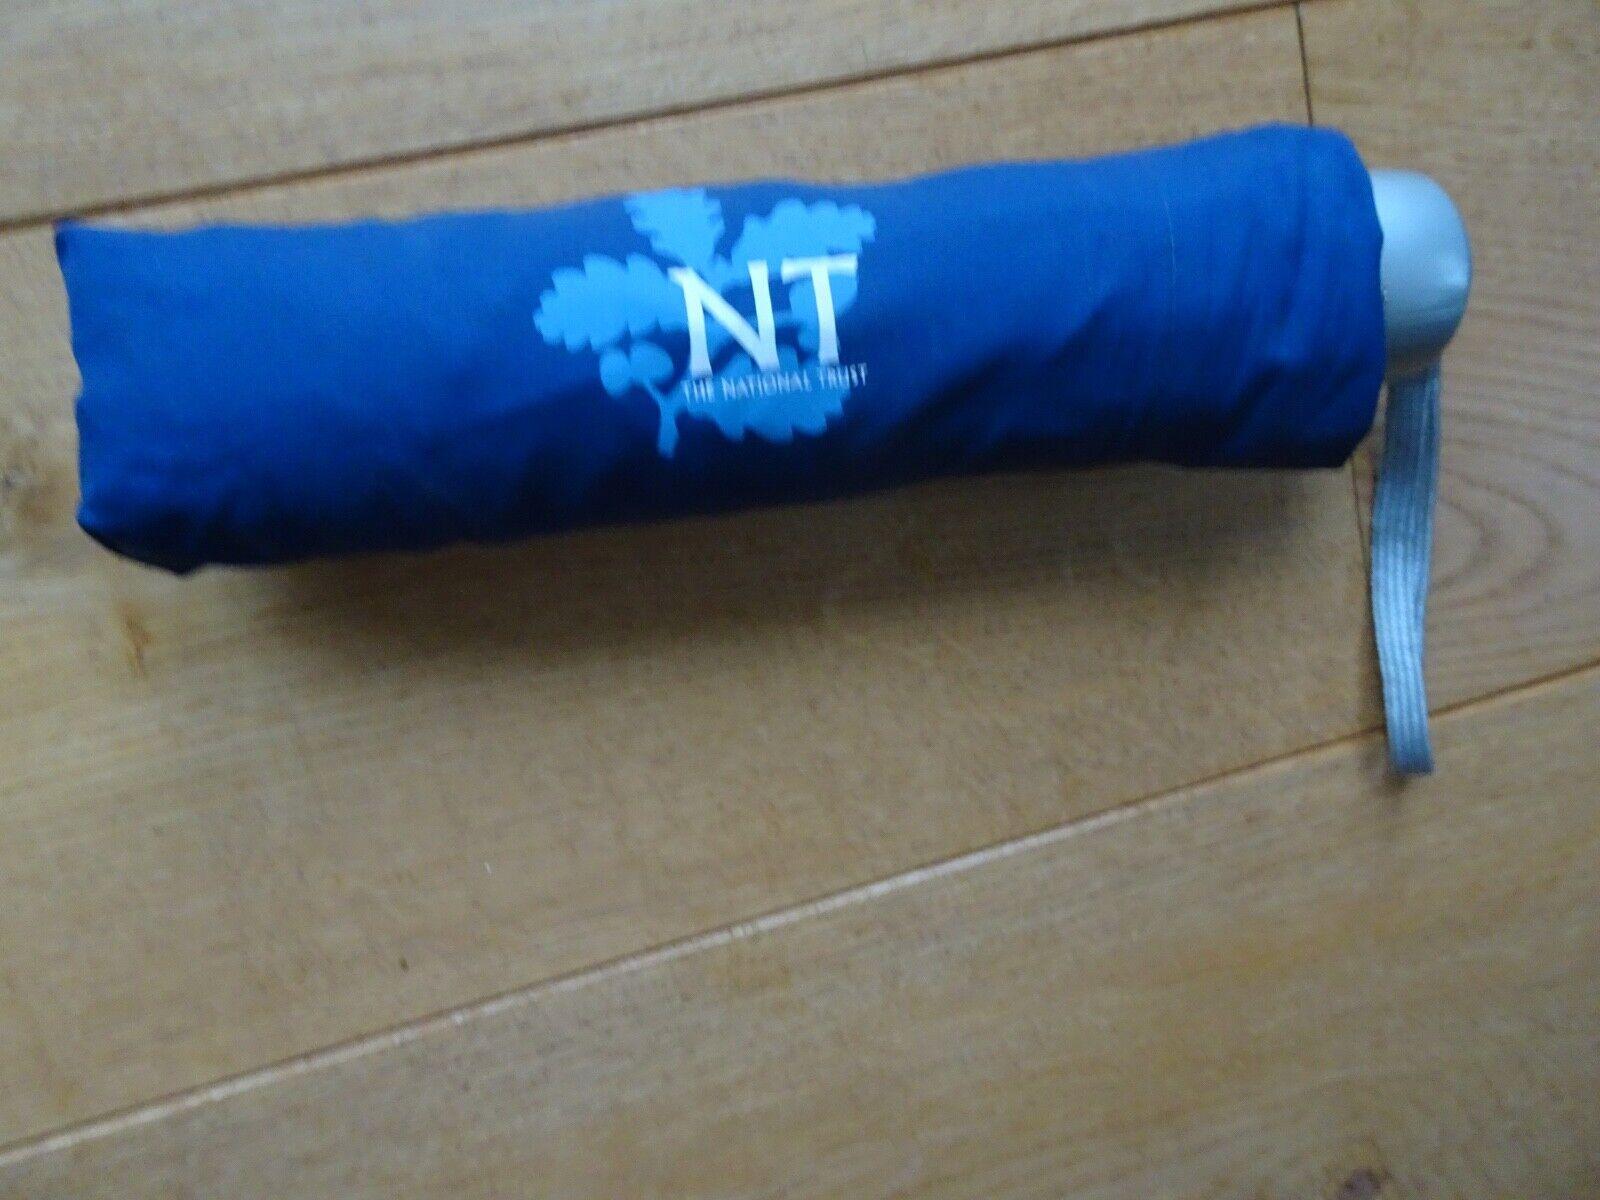 NATIONAL TRUST BLUE UMBRELLA WITH SLEEVE COVER UMBRELLA